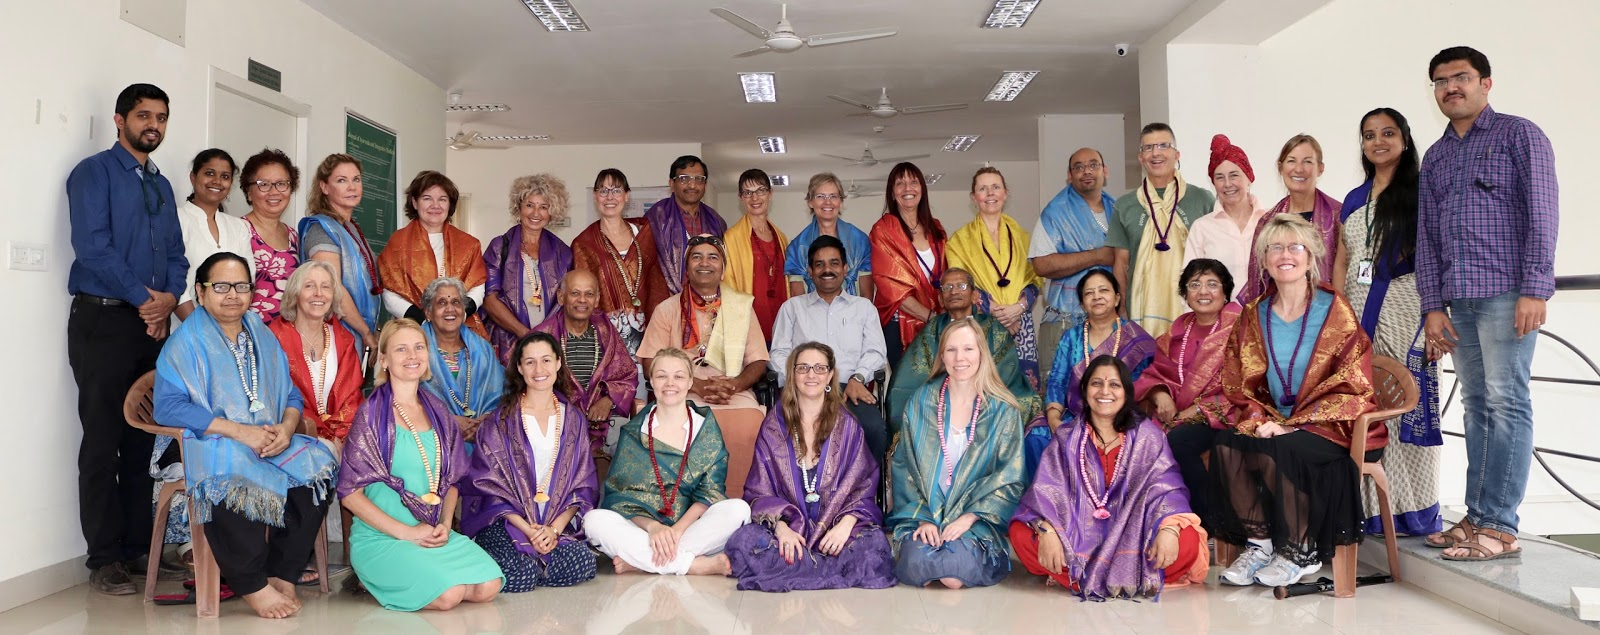 Raja yoga centres in bangalore dating